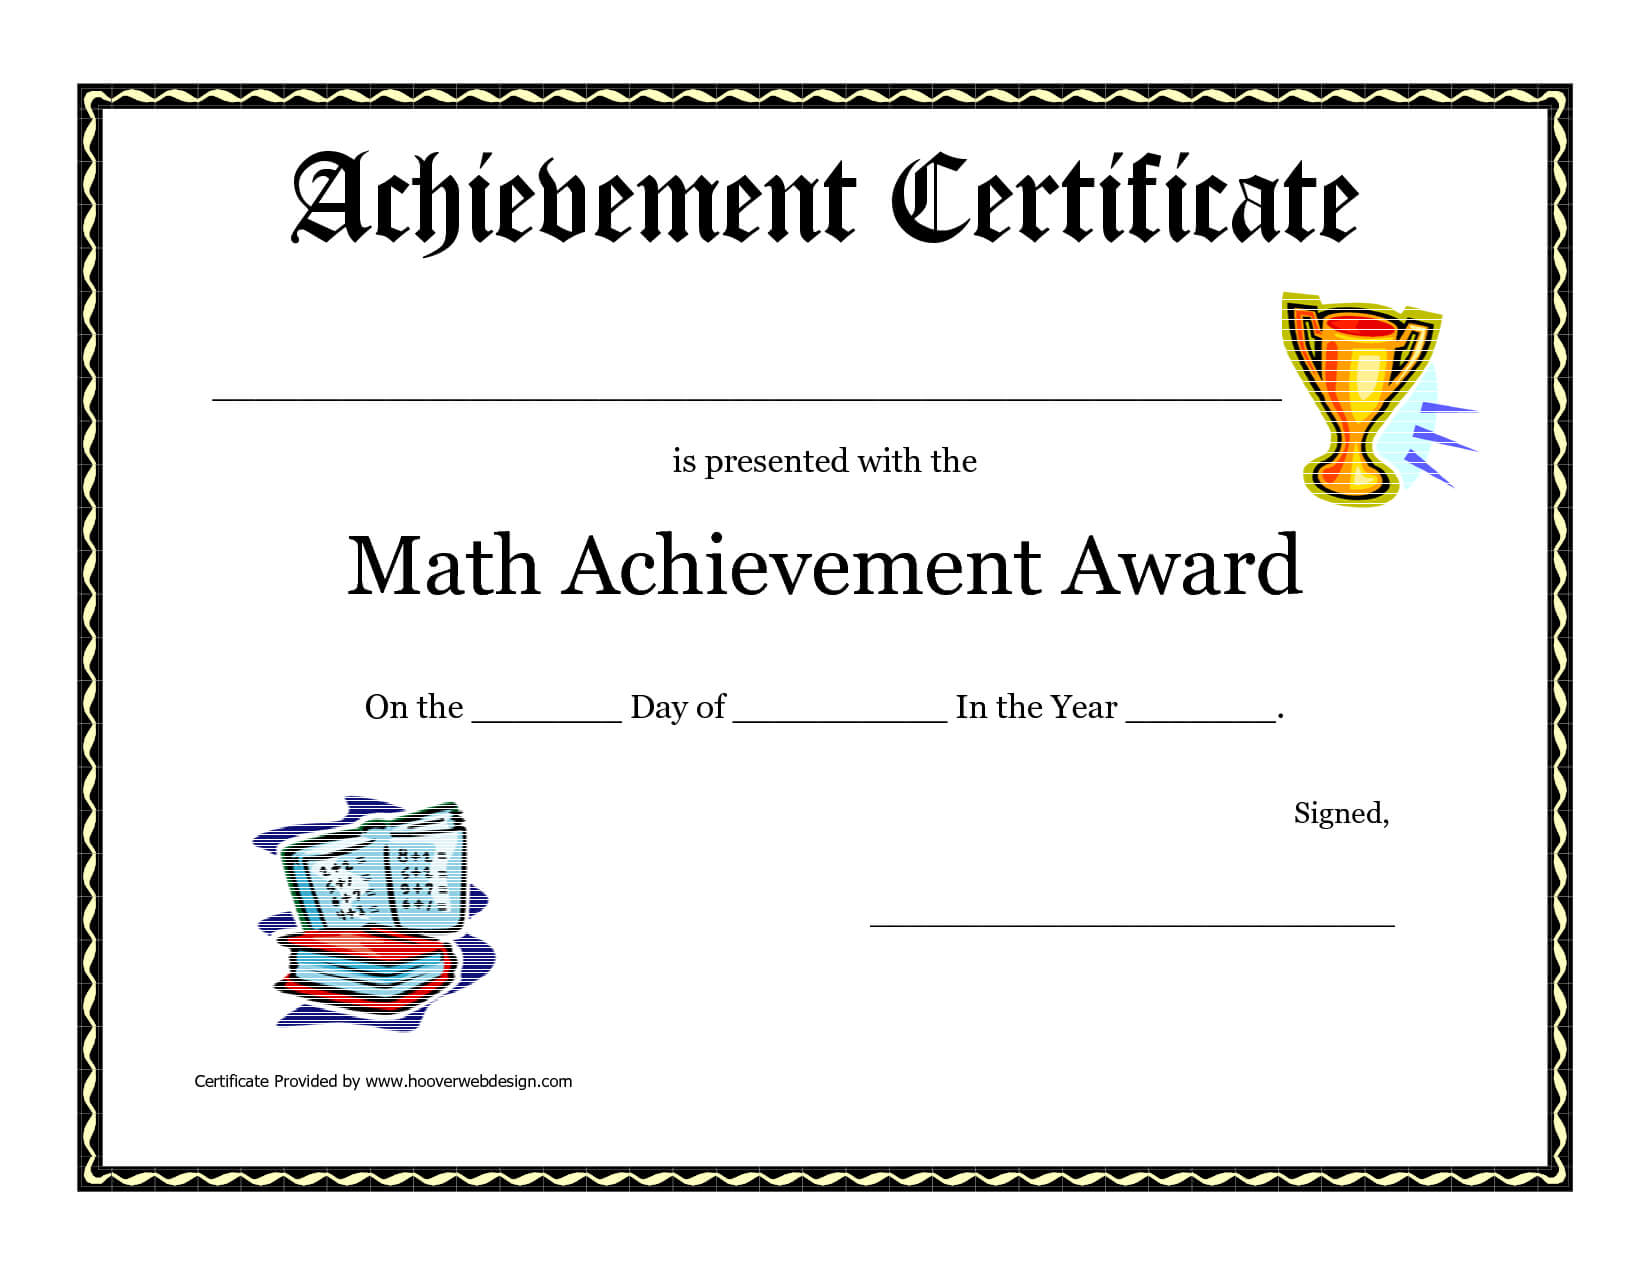 Math Achievement Award Printable Certificate Pdf | Award With Regard To Math Certificate Template